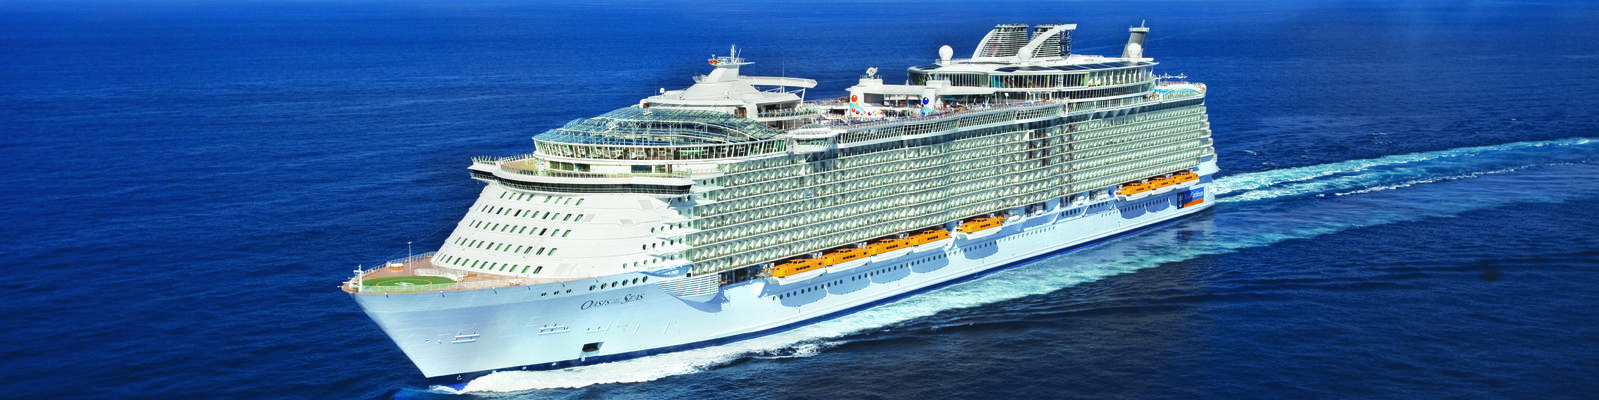 Oasis of the Seas (Photo: Royal Caribbean International)